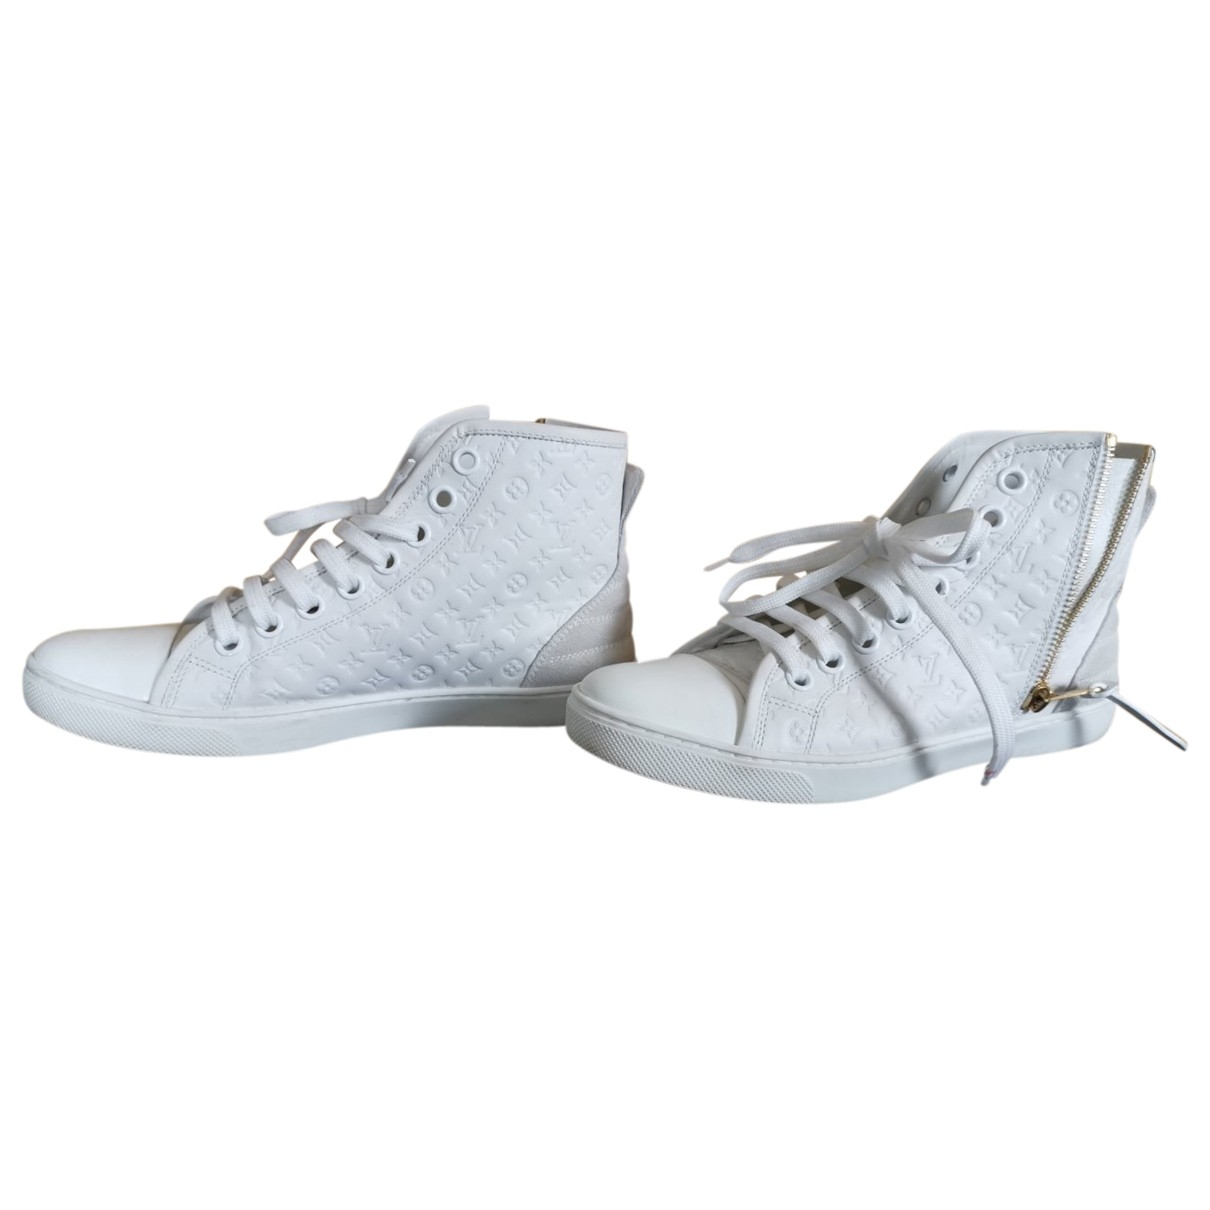 Louis Vuitton Stellar White Leather Trainers for Women 37.5 EU